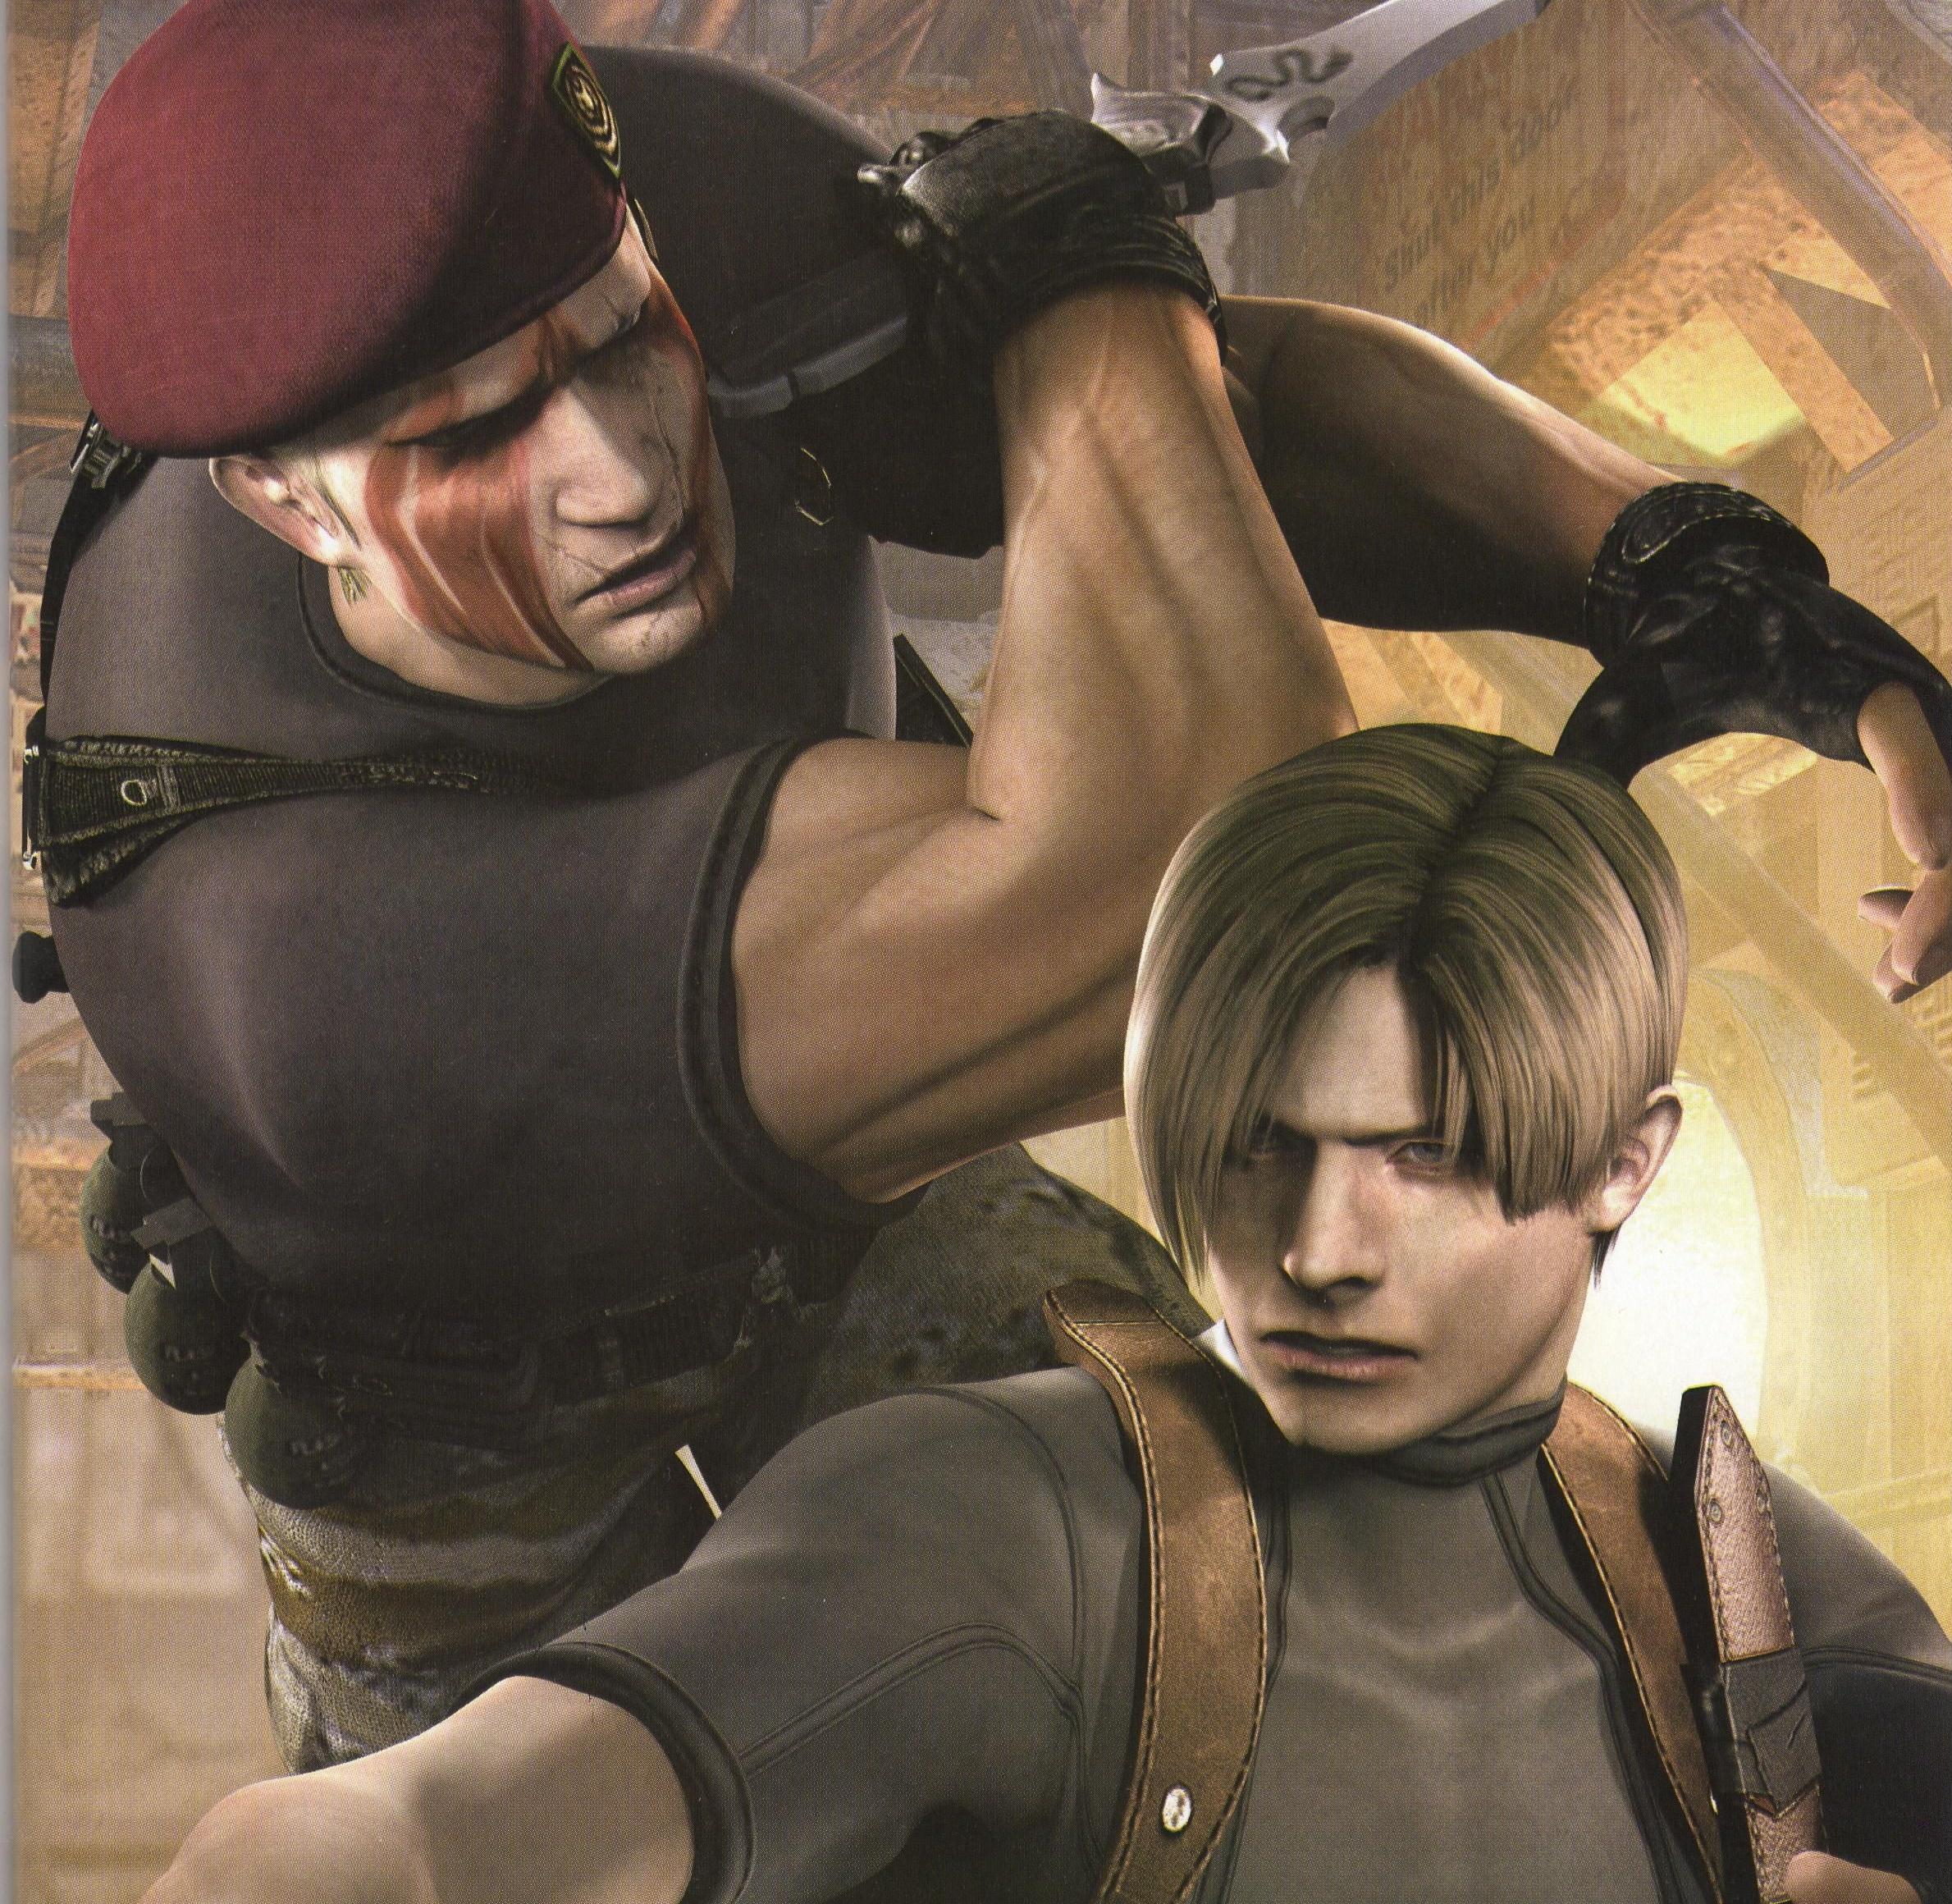 (Source: Capcom / Reproduction)